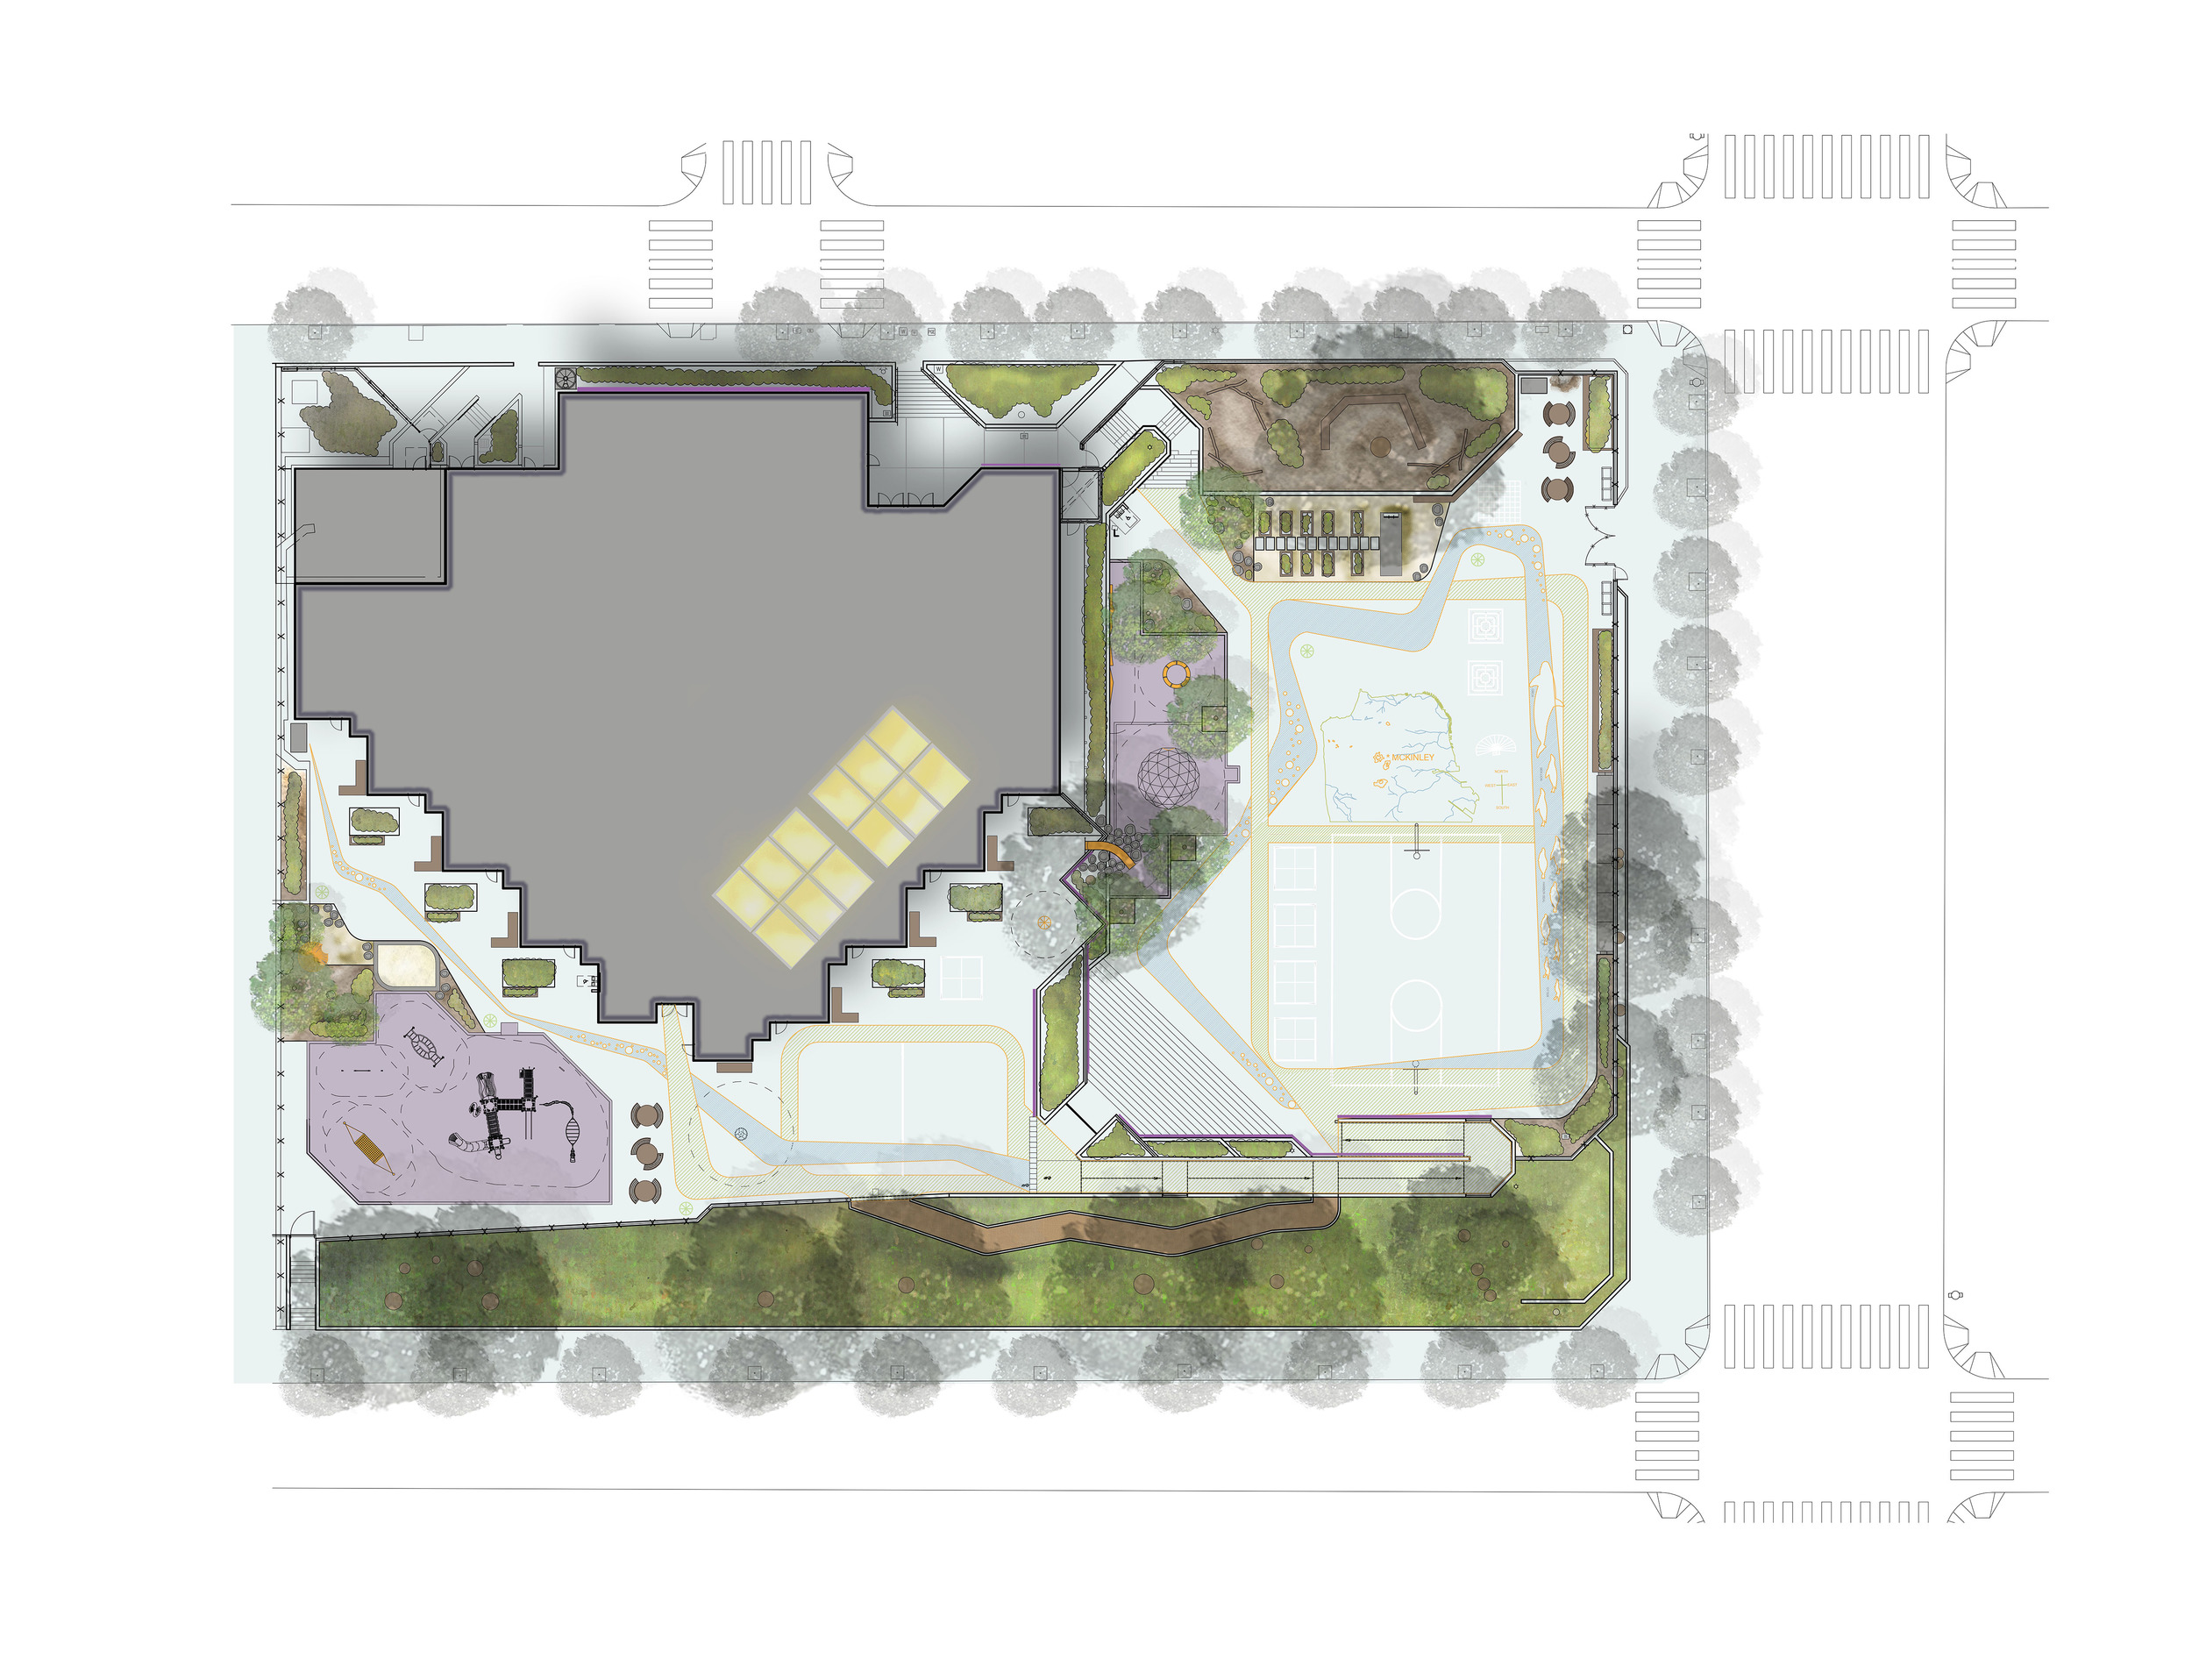 160518_McKinley Masterplan Draft.jpg